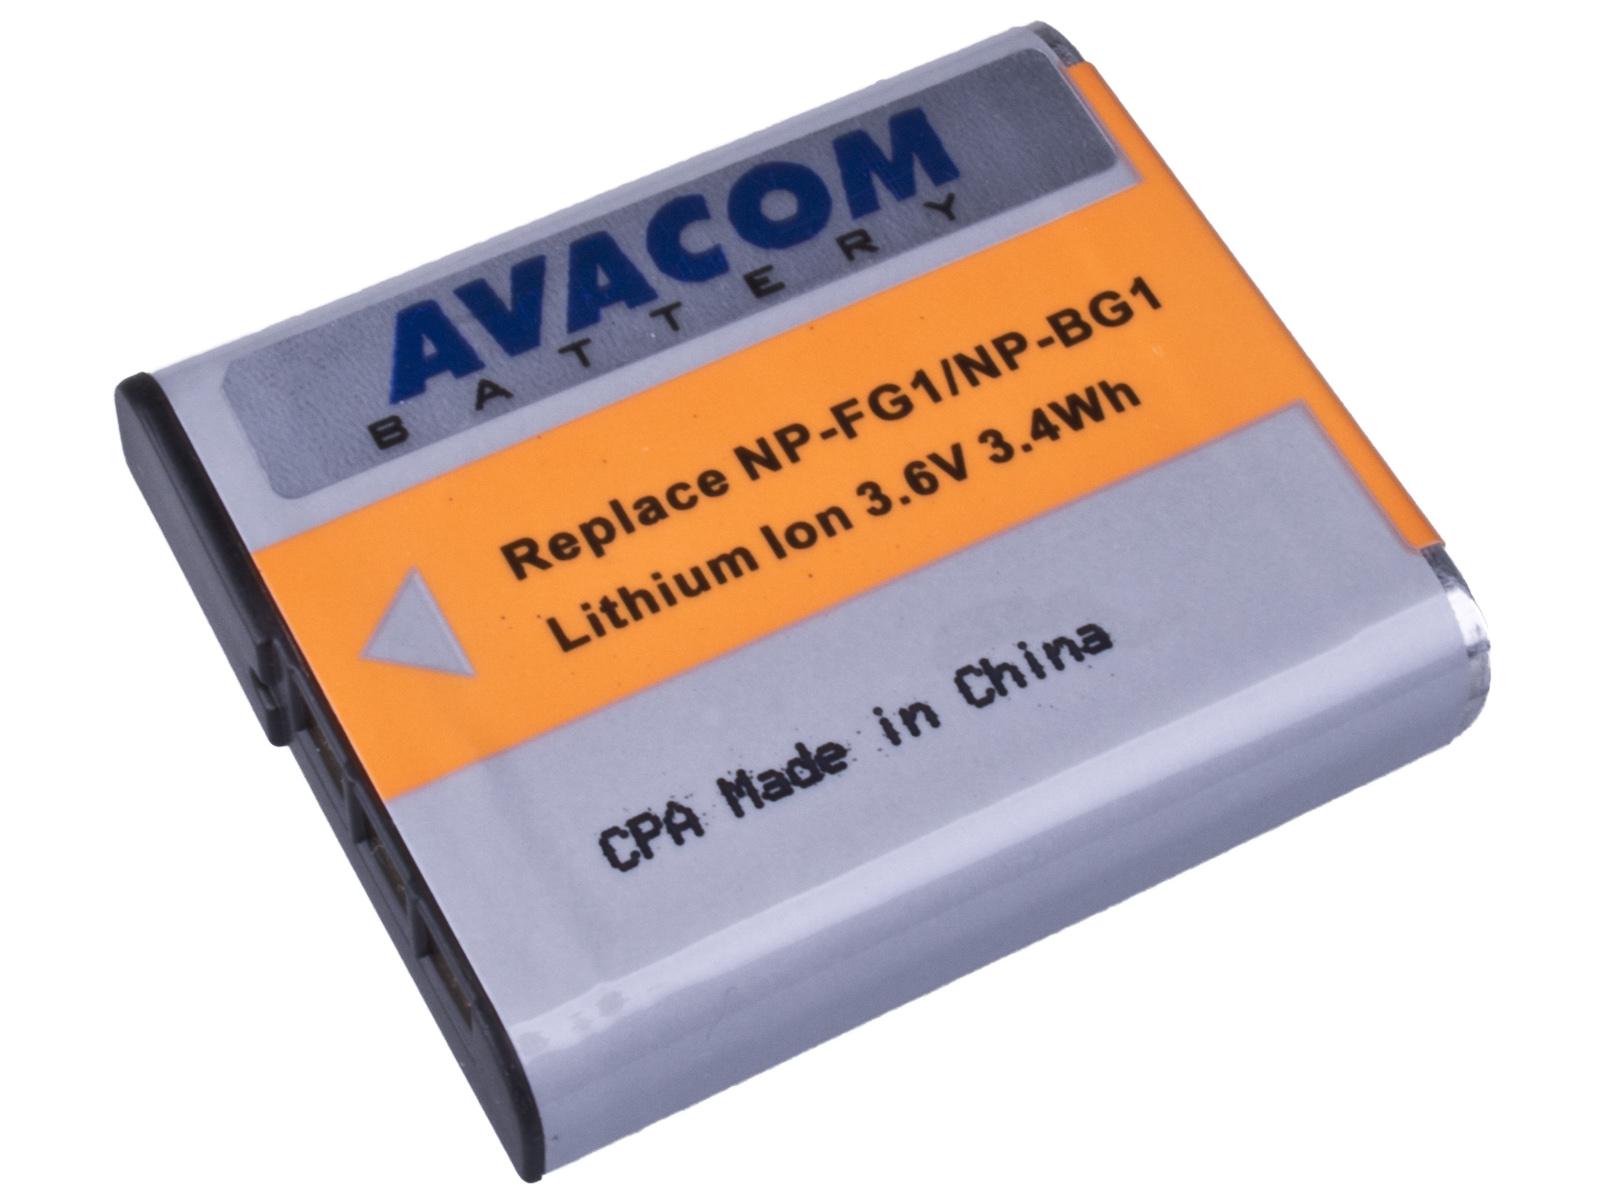 Baterie AVACOM Sony NP-BG1N, FG1 Li-ion 3.6V 950mA